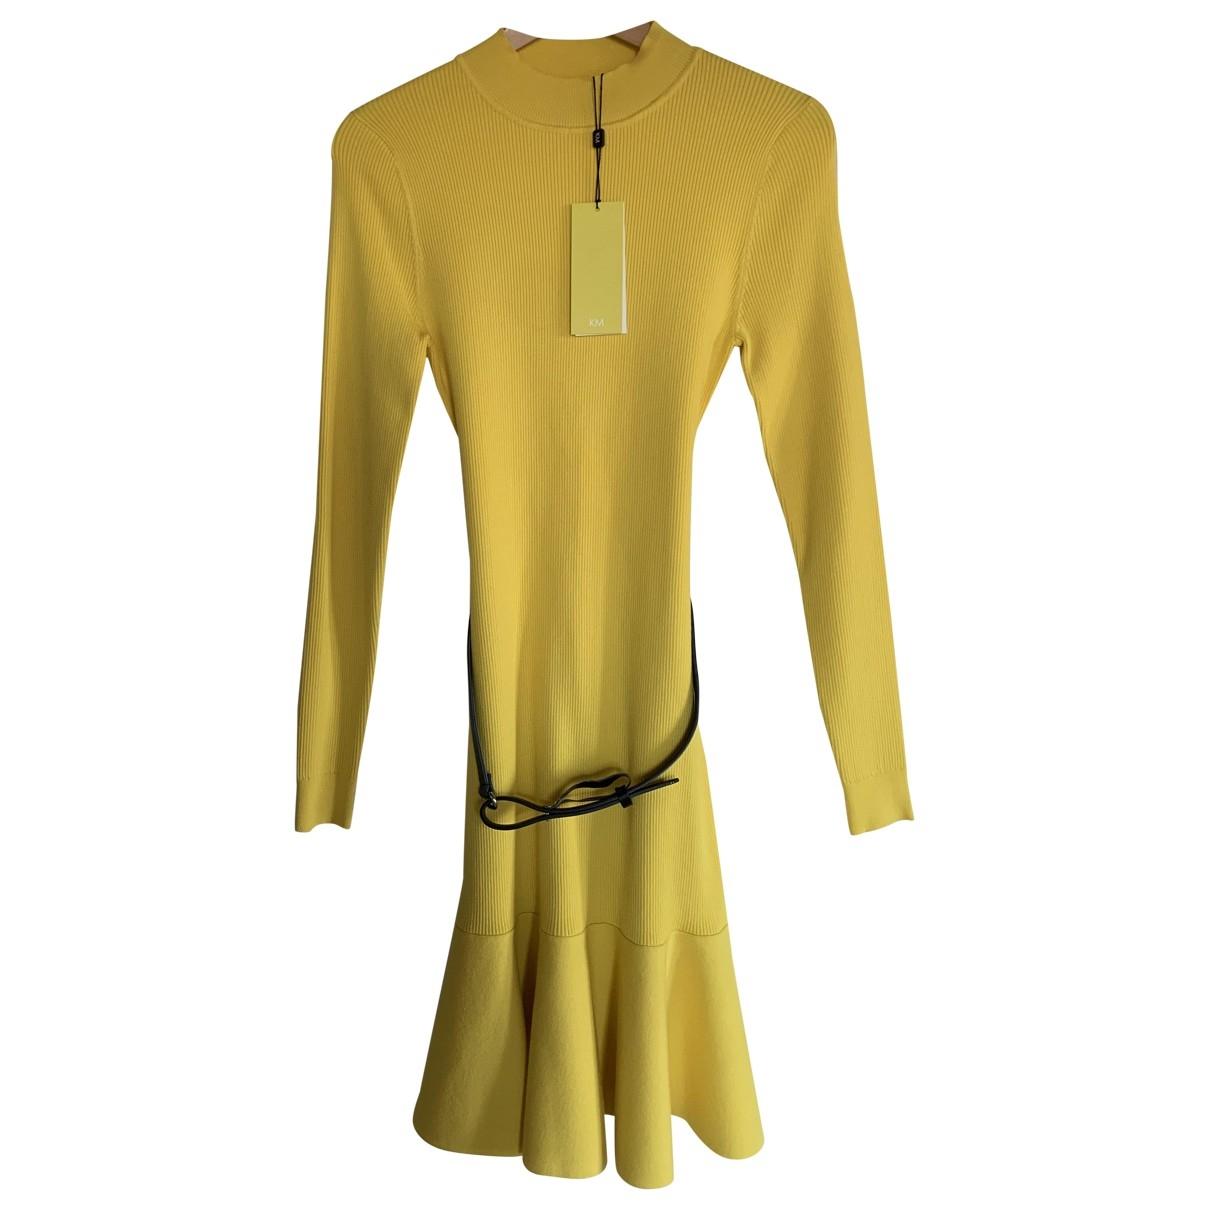 Karen Millen \N Kleid in  Gelb Viskose